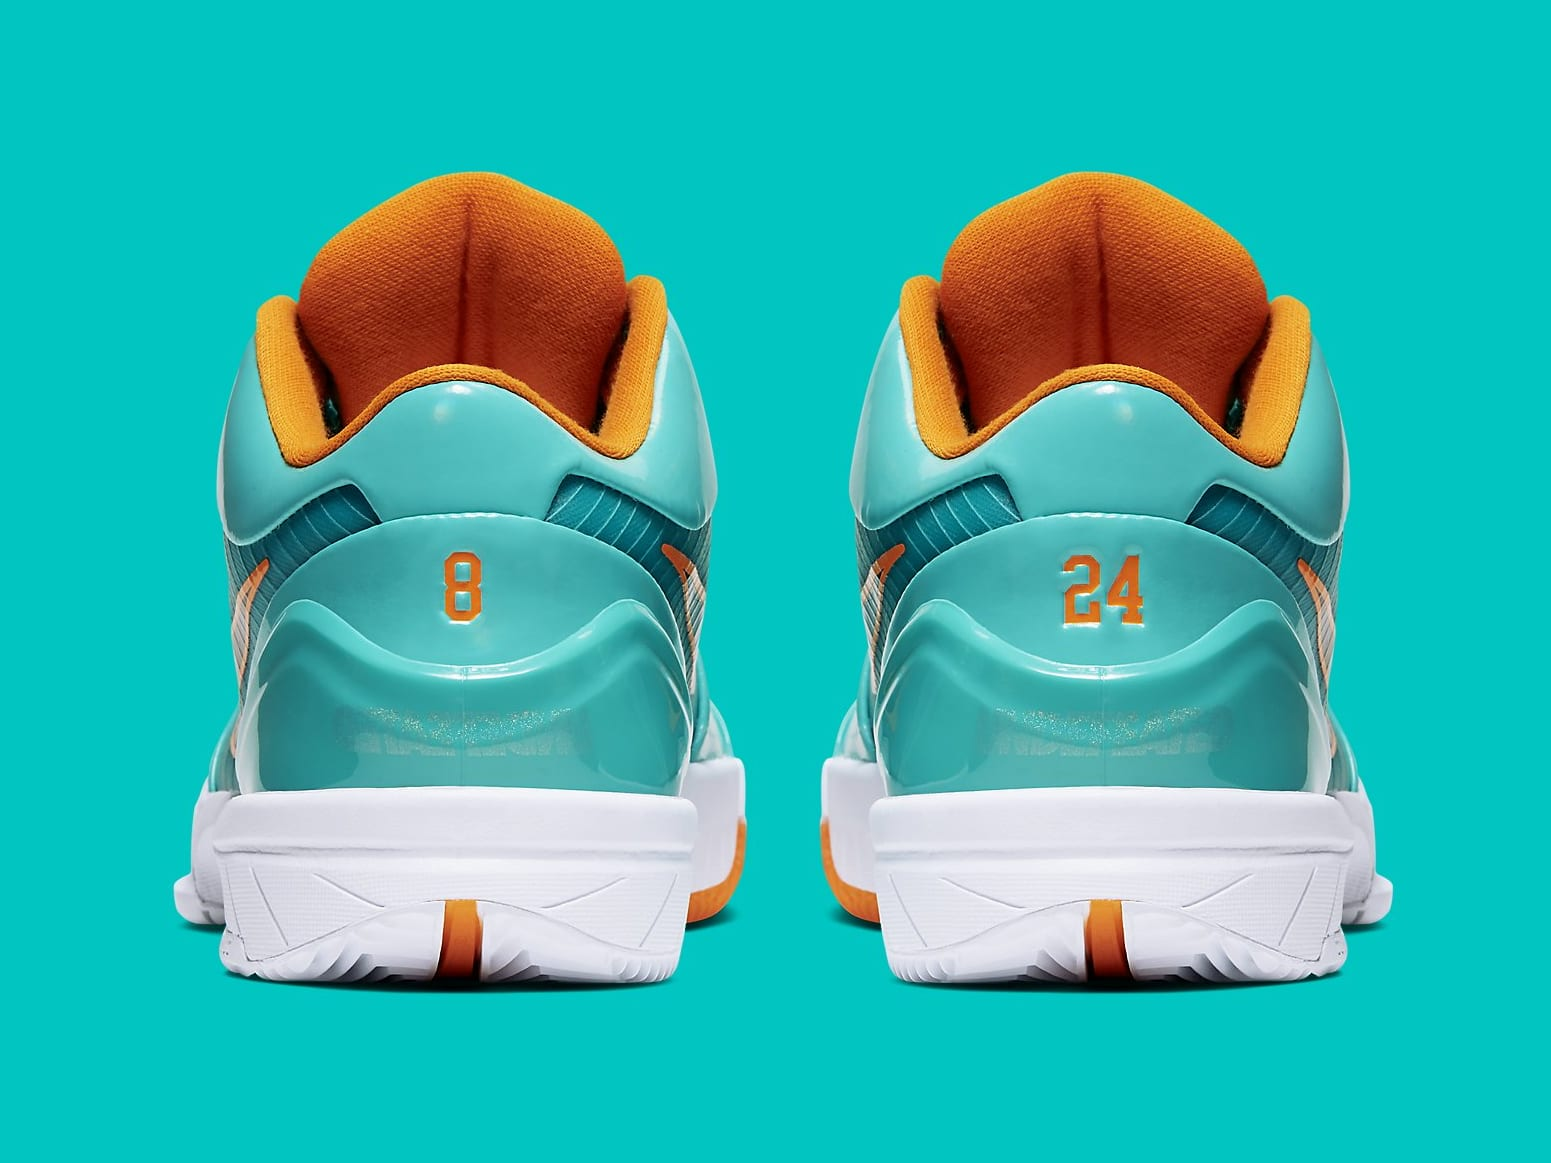 UNDFTD x Nike Kobe 4 Protro Teal Release Date CQ38869-300 Heel